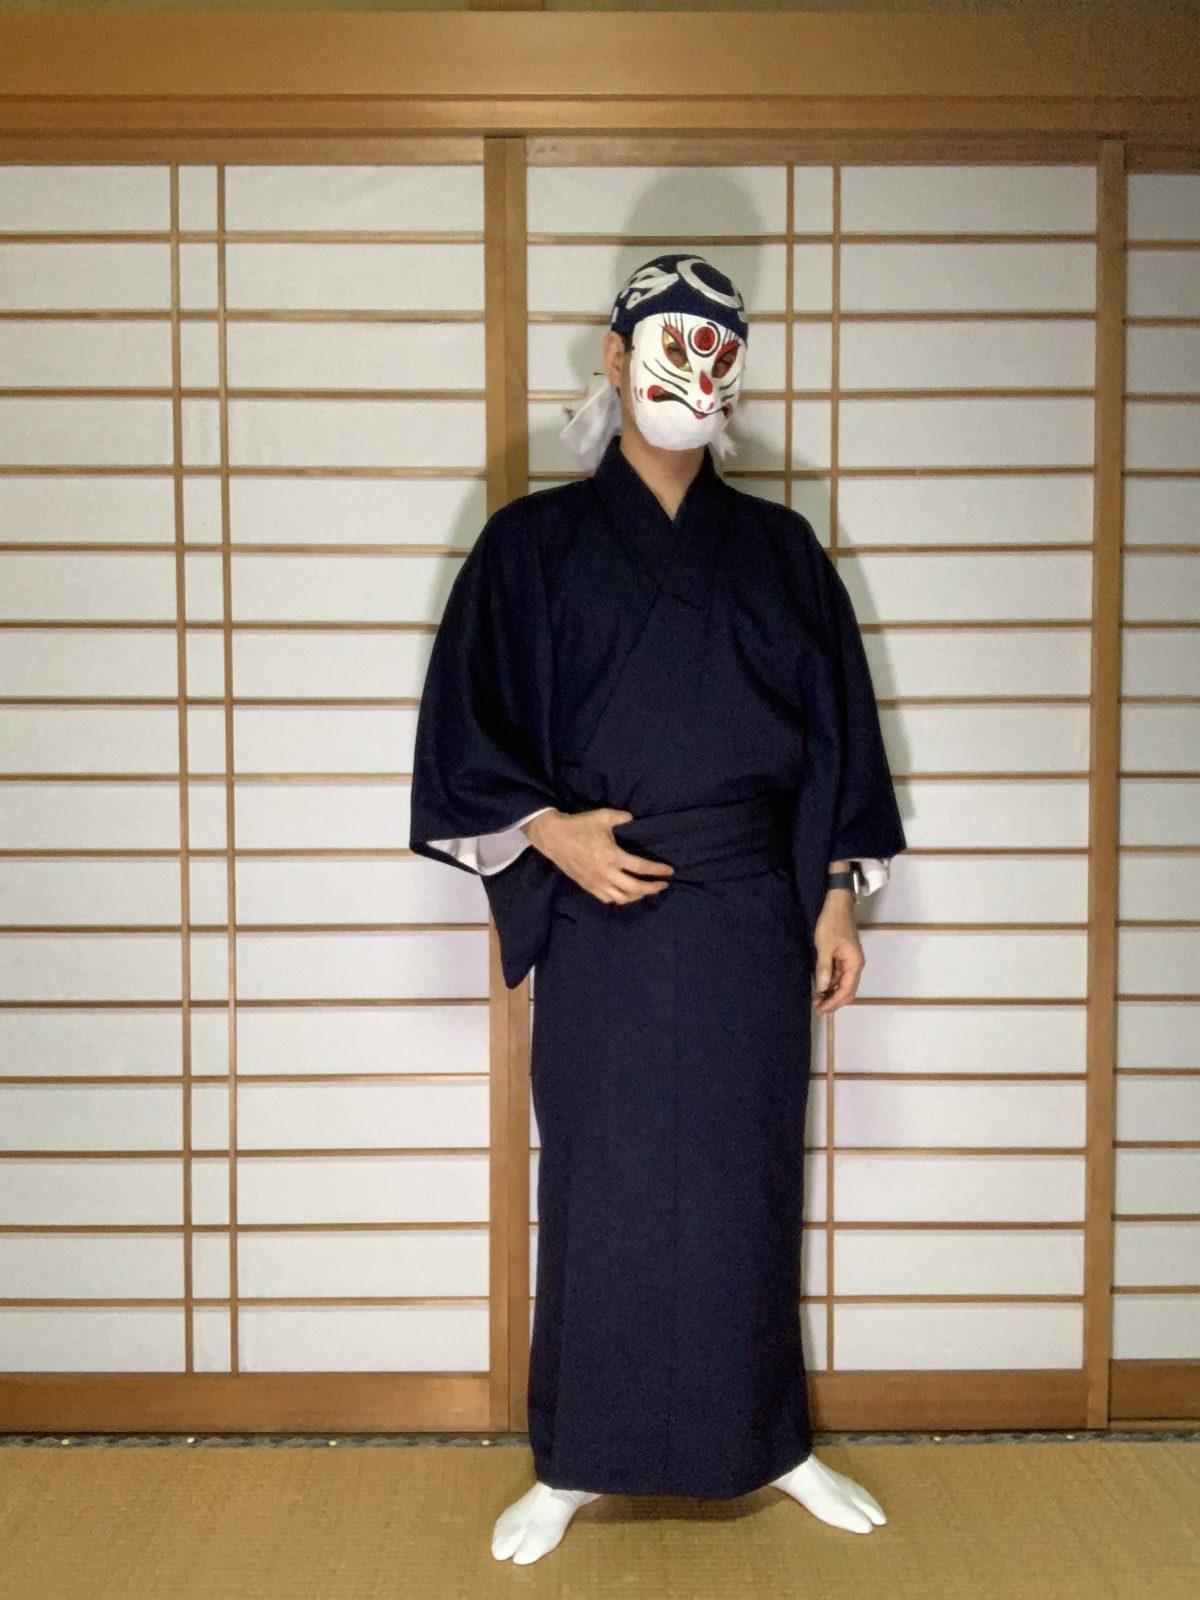 男の和服,メンズ着物,狐面,日本,裏着物,浴衣,和,文化,春秋,